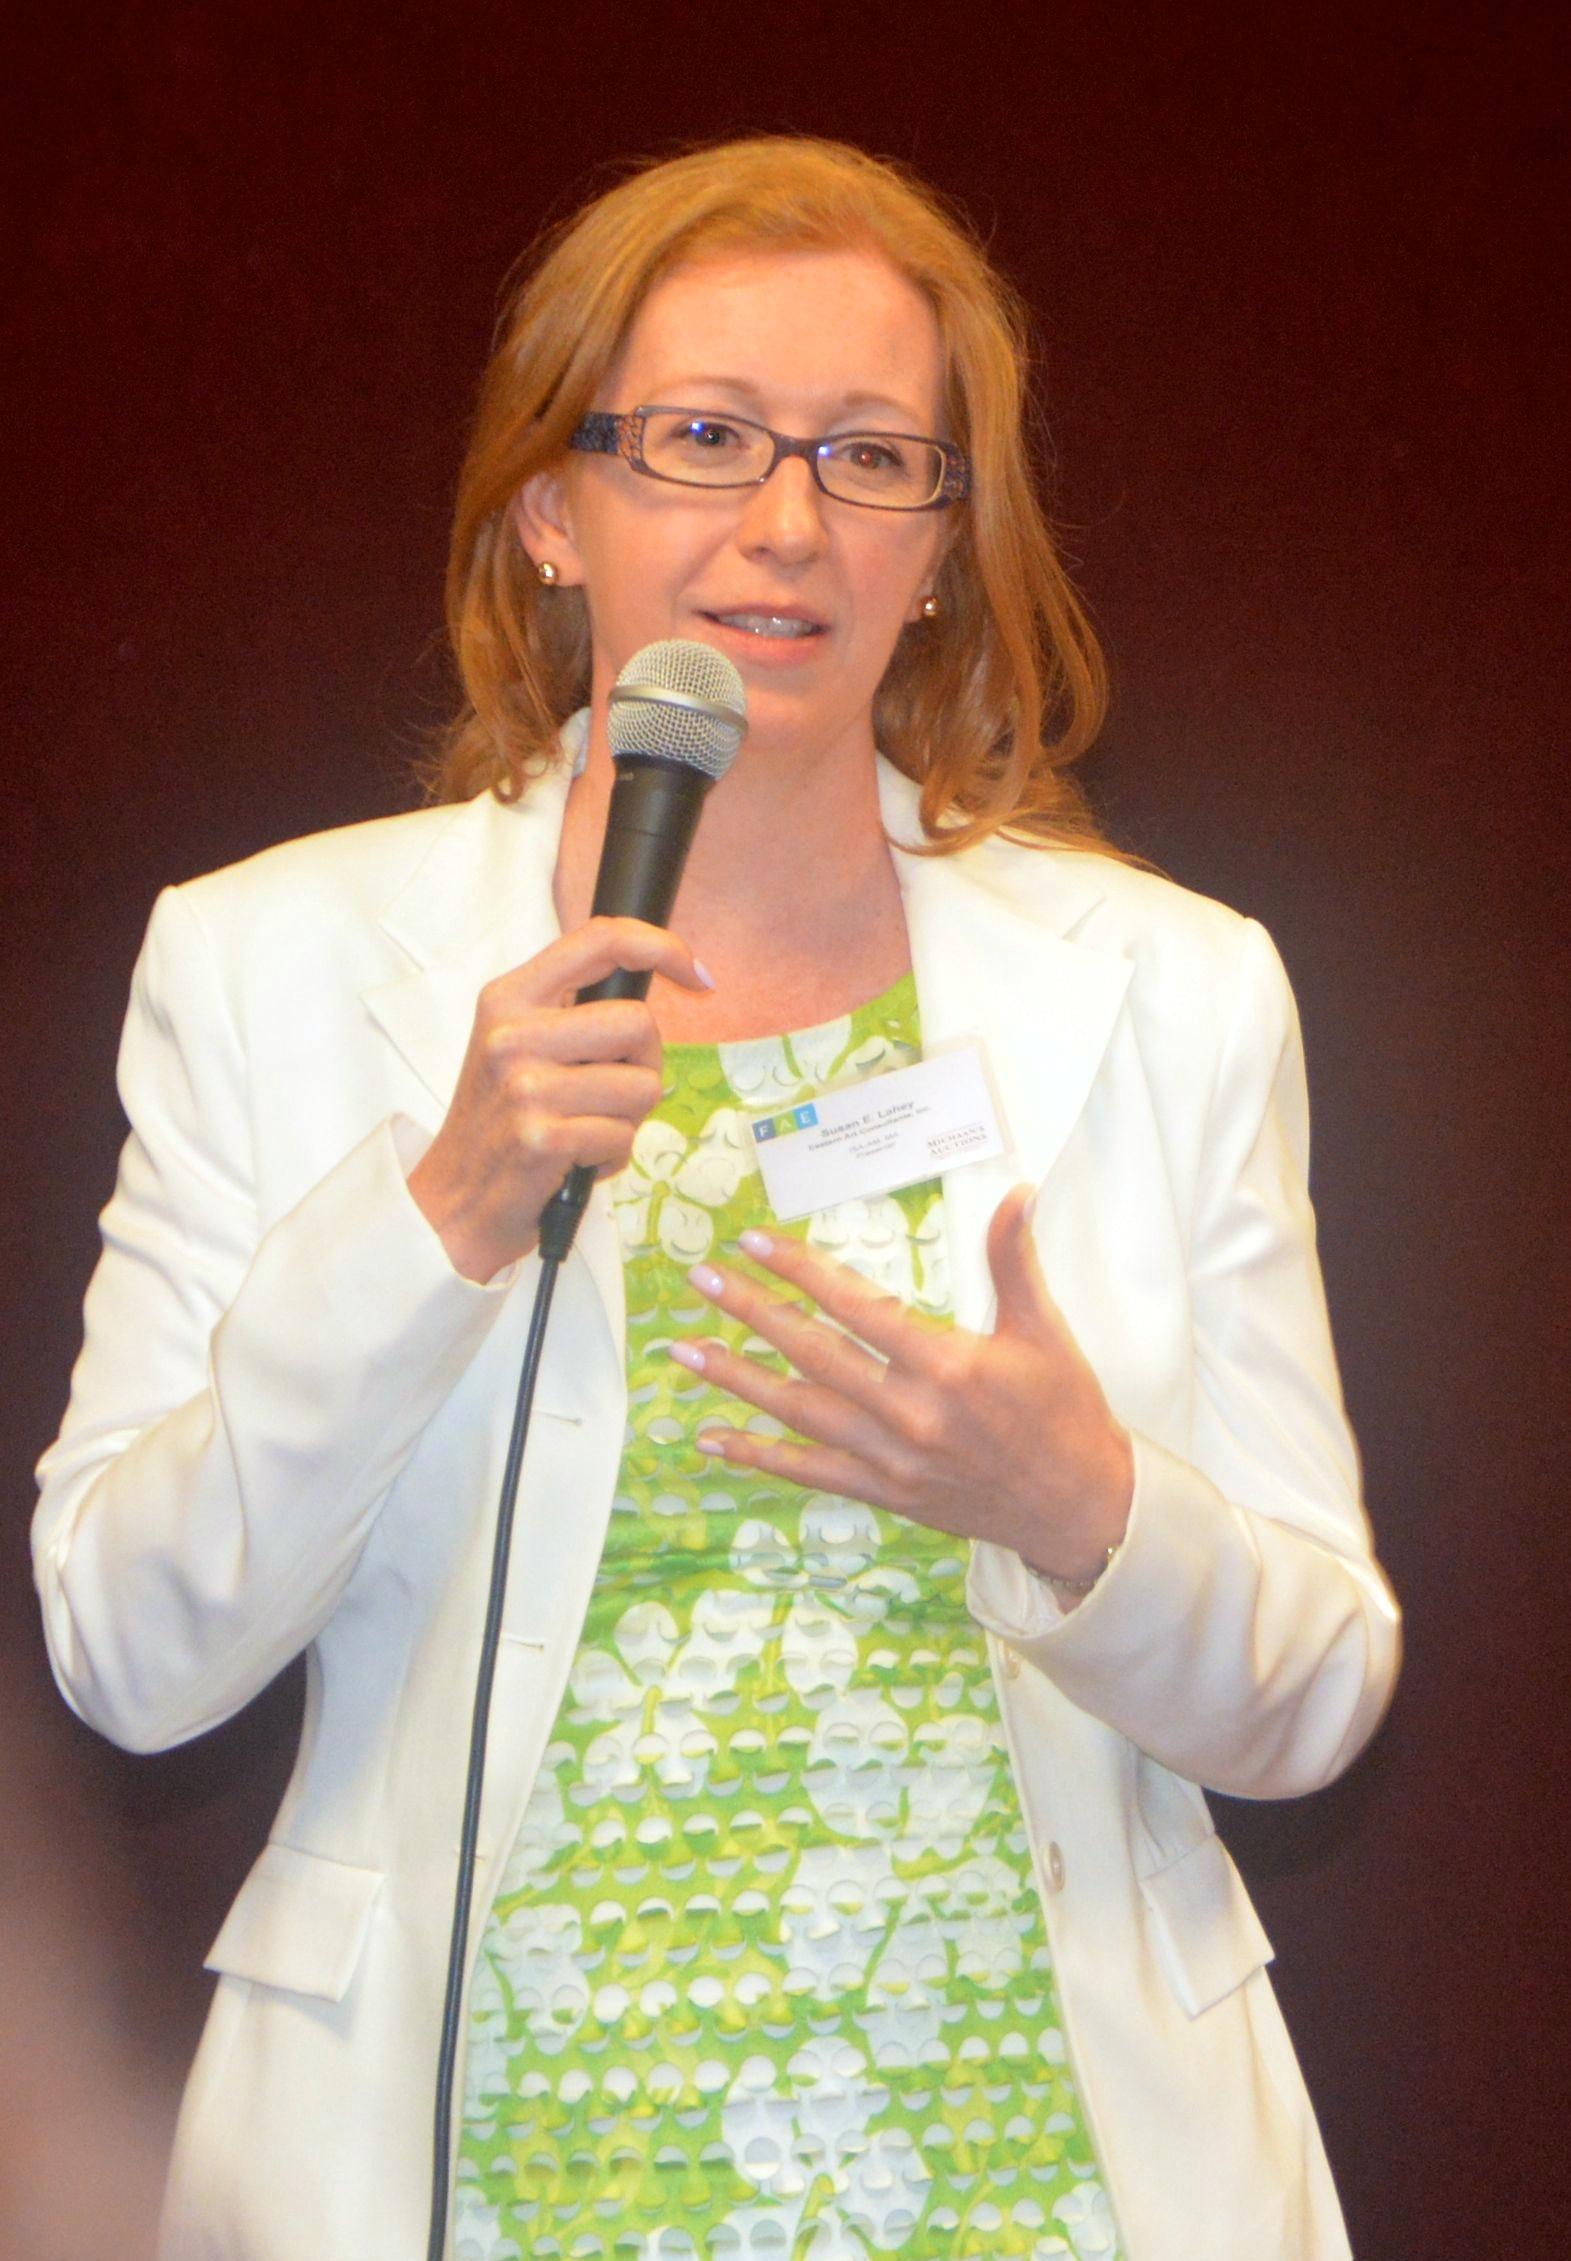 Susan Lahey, President, Eastern Art Consultants Inc.